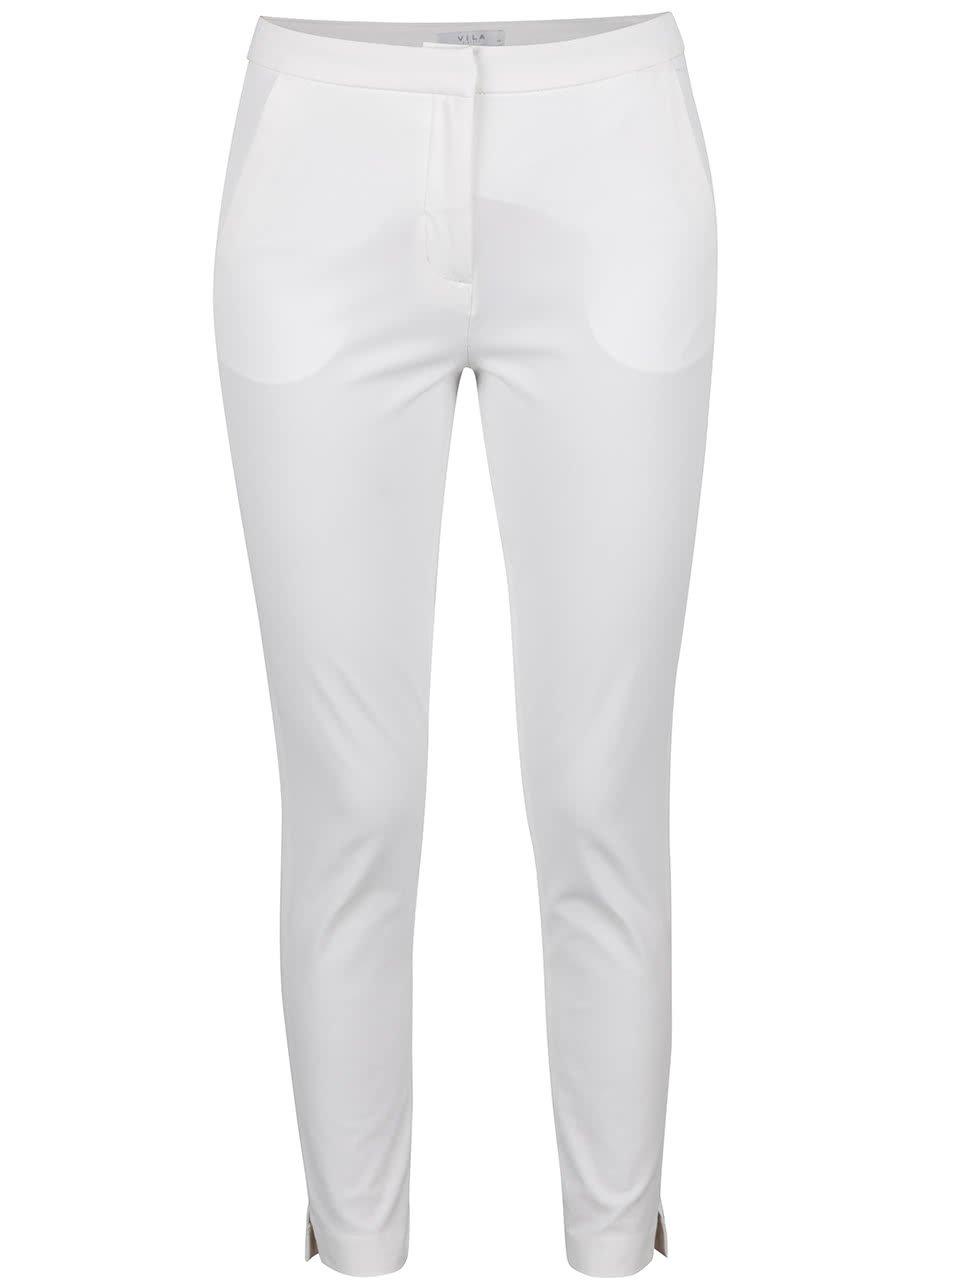 Krémové kalhoty VILA Erika